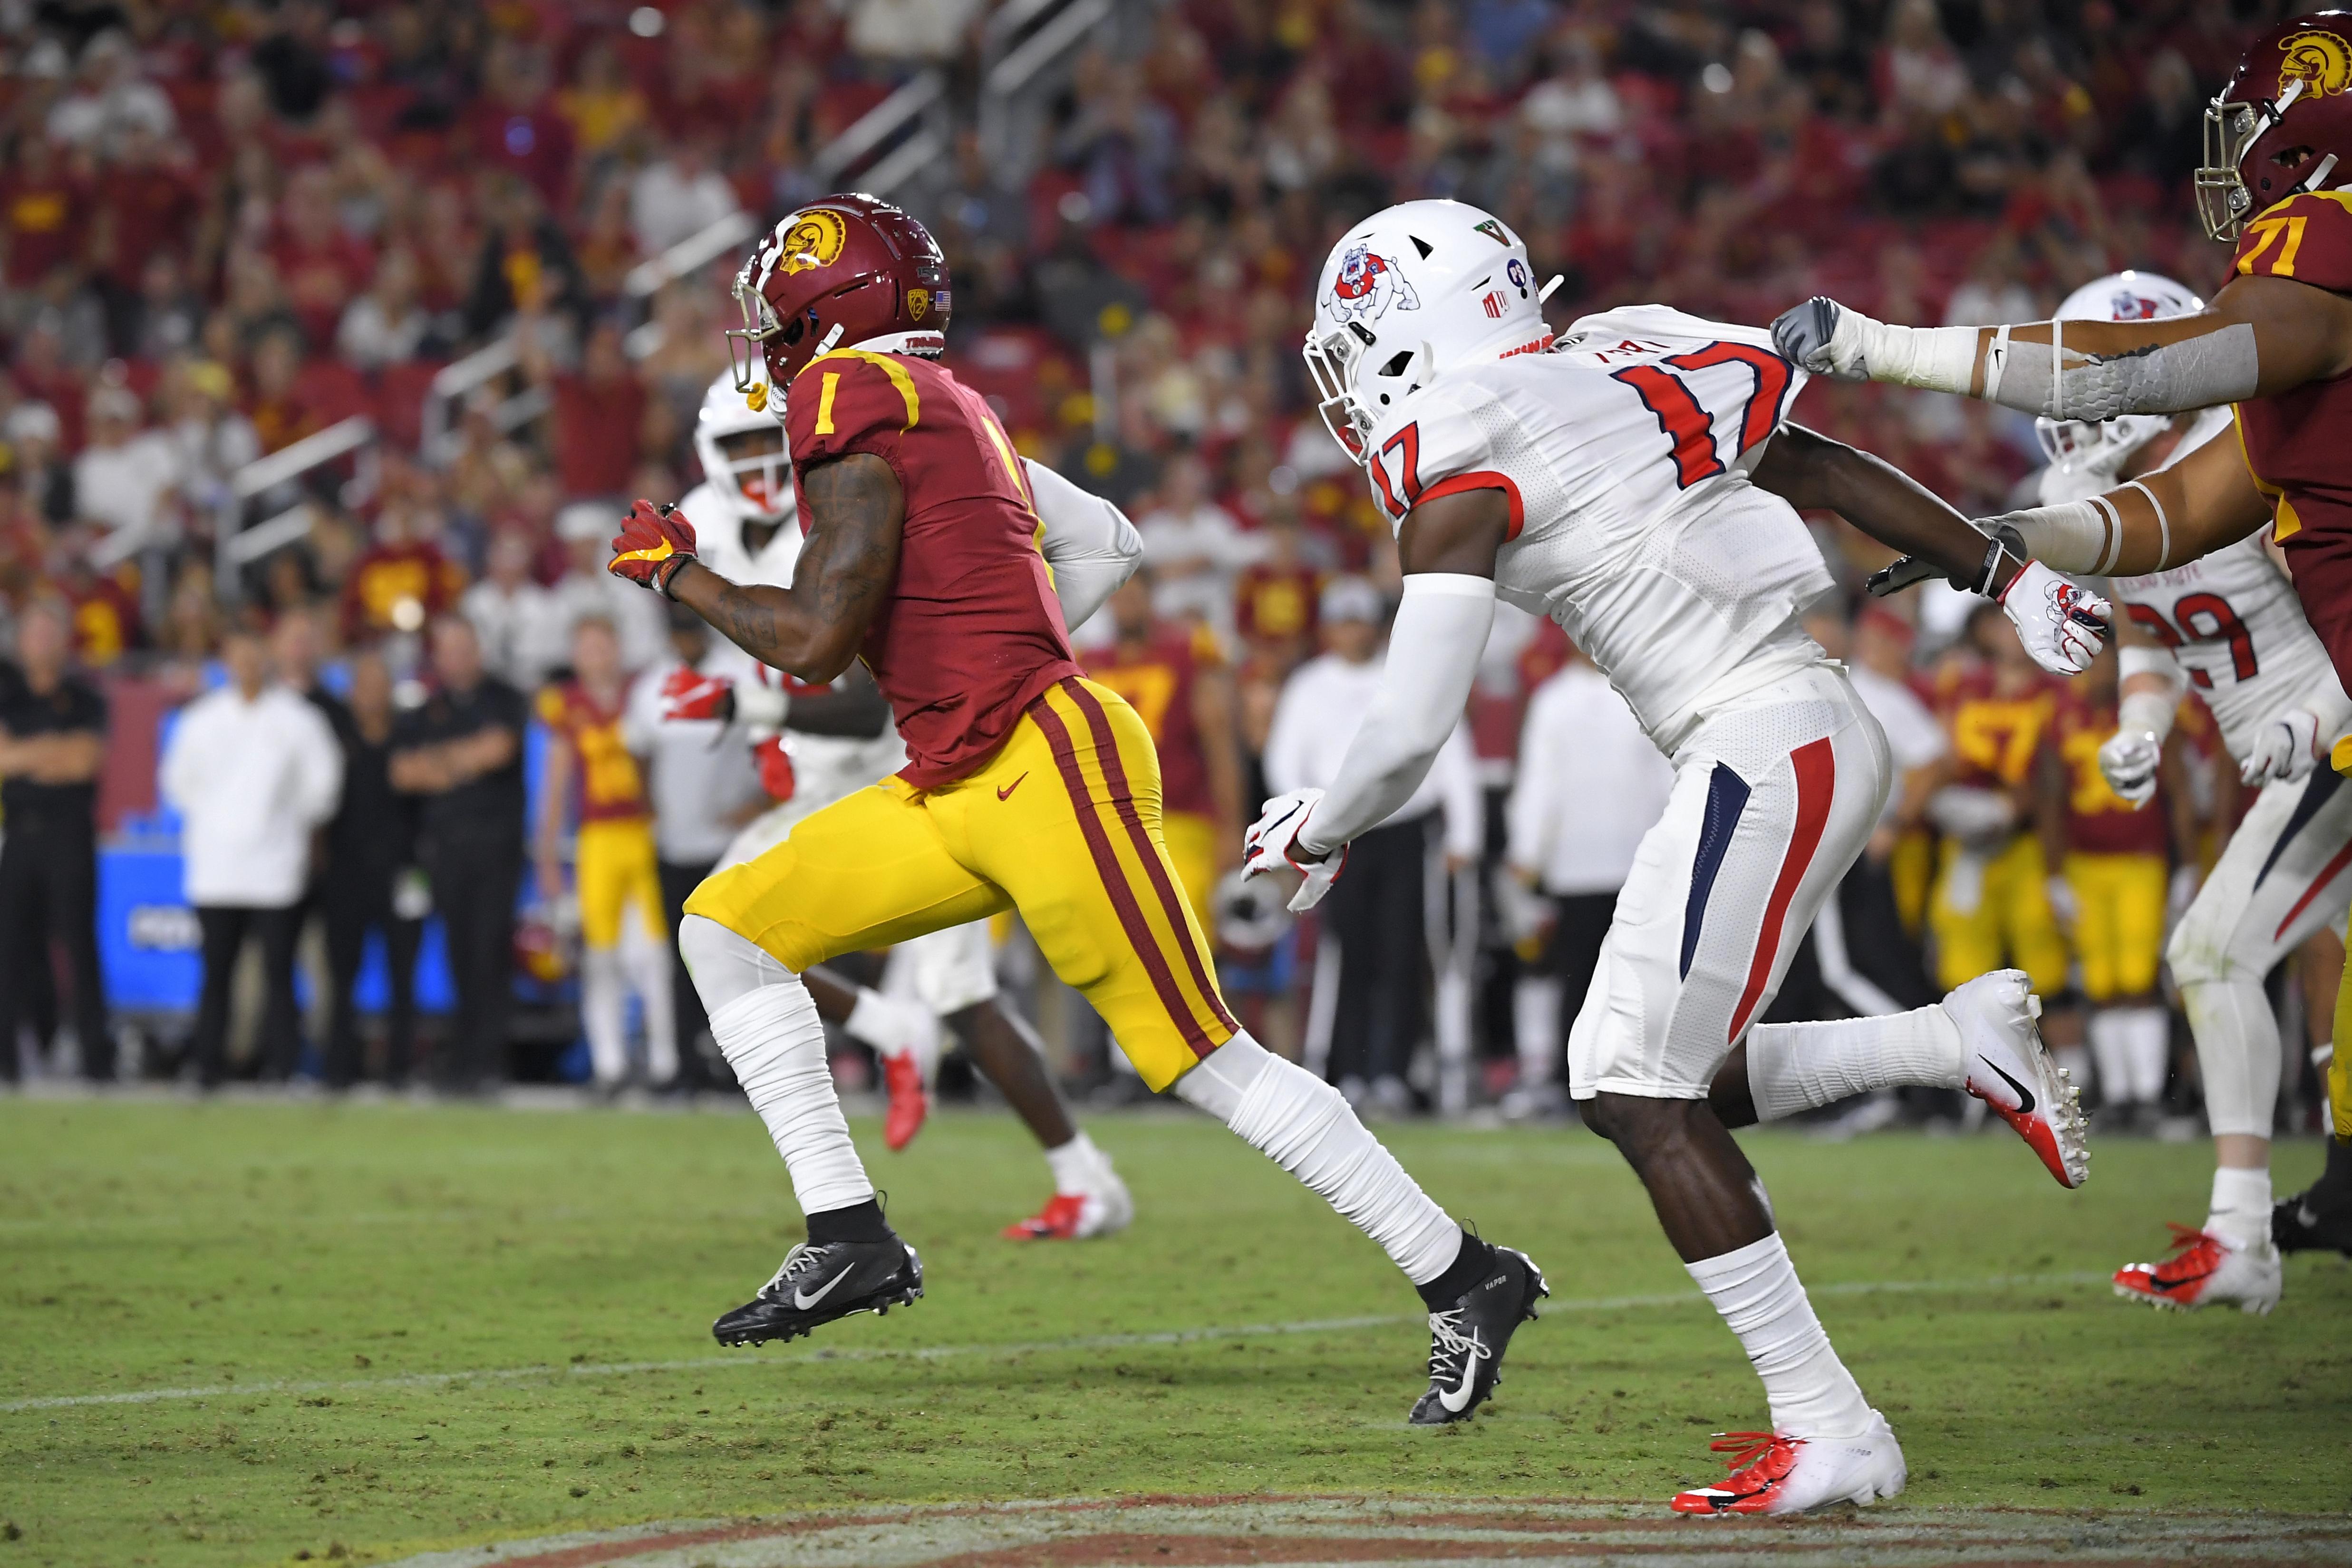 Many happy returns: KR Velus Jones Jr. shines back at USC